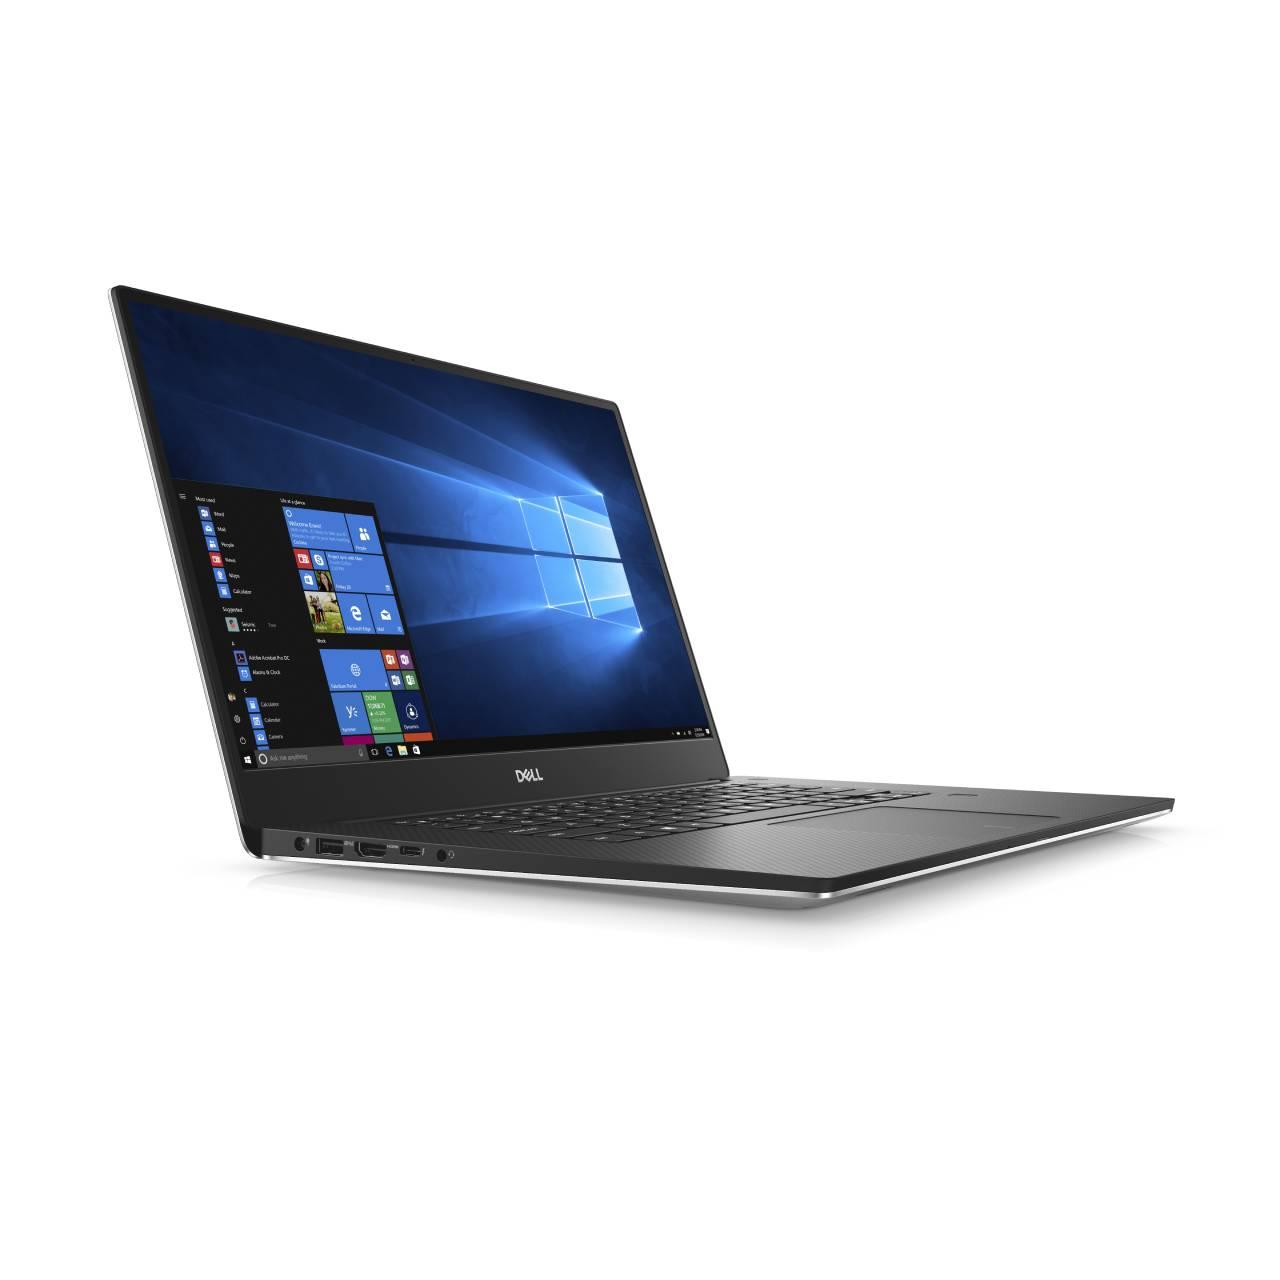 "Dell XPS 15 7590 Laptop: Intel Core I7-9750H, 15.6"" 1080p IPS, 8GB DDR4, 256GB SSD, GTX 1650, Win 10 + $67.14 Back In Points $1195.59 AC + Free Shipping @ Rakuten"